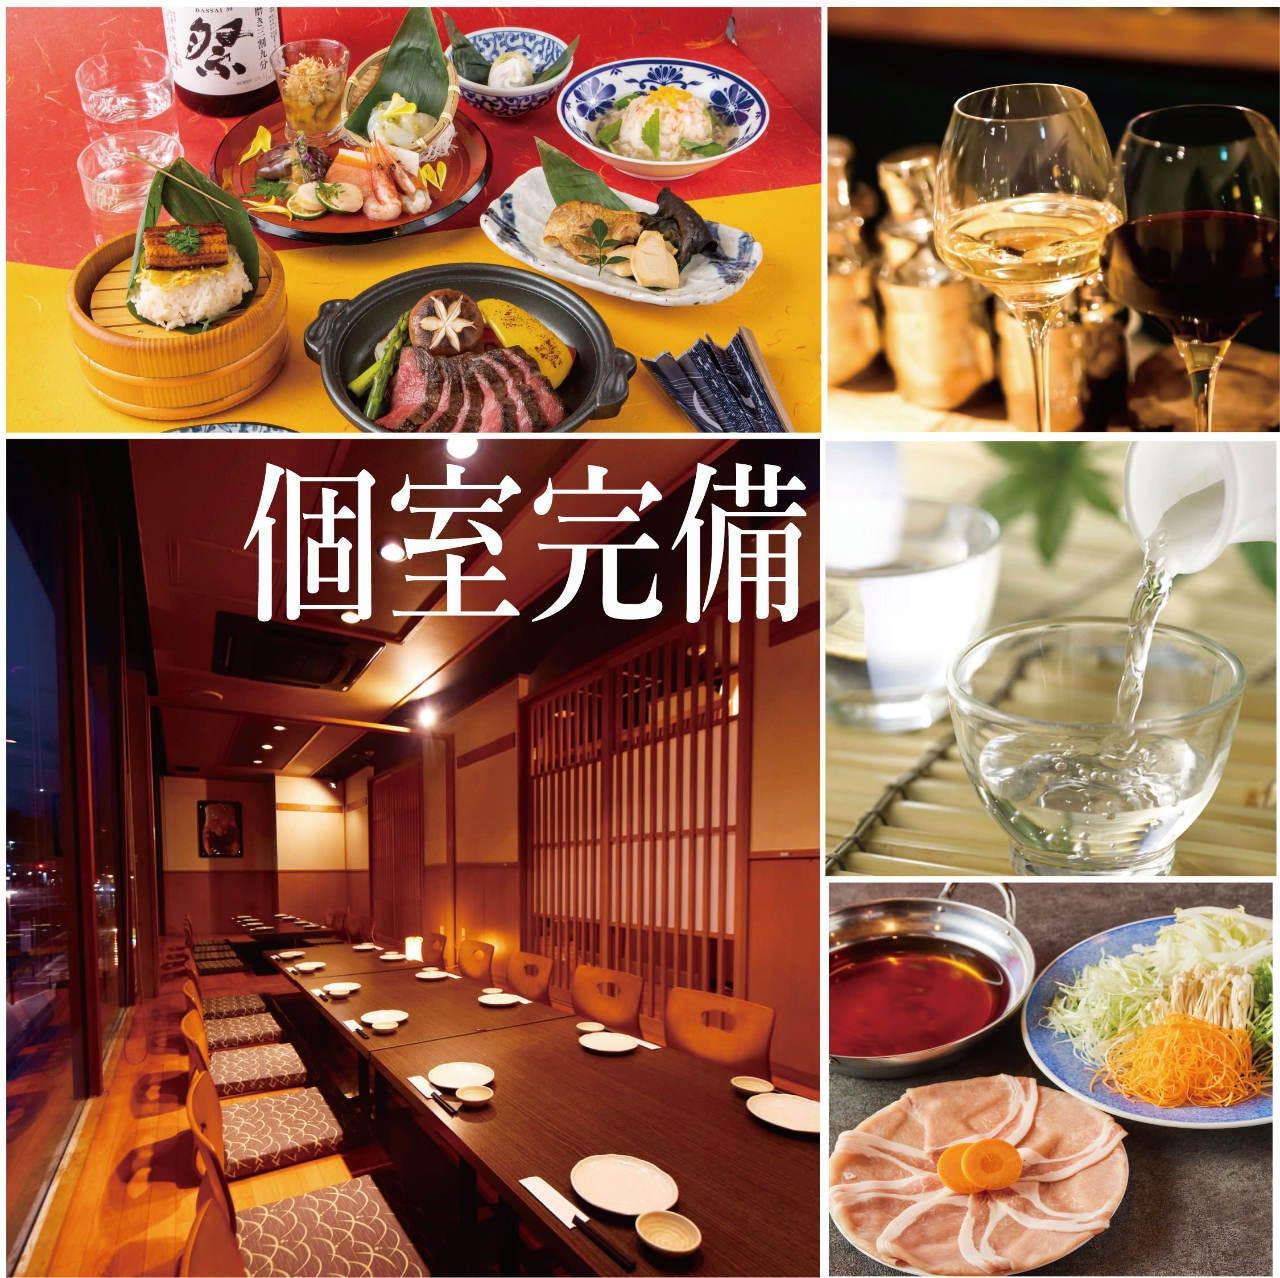 創作和風 個室居酒屋 茜屋 ~akaneya~ 甲府店のイメージ写真